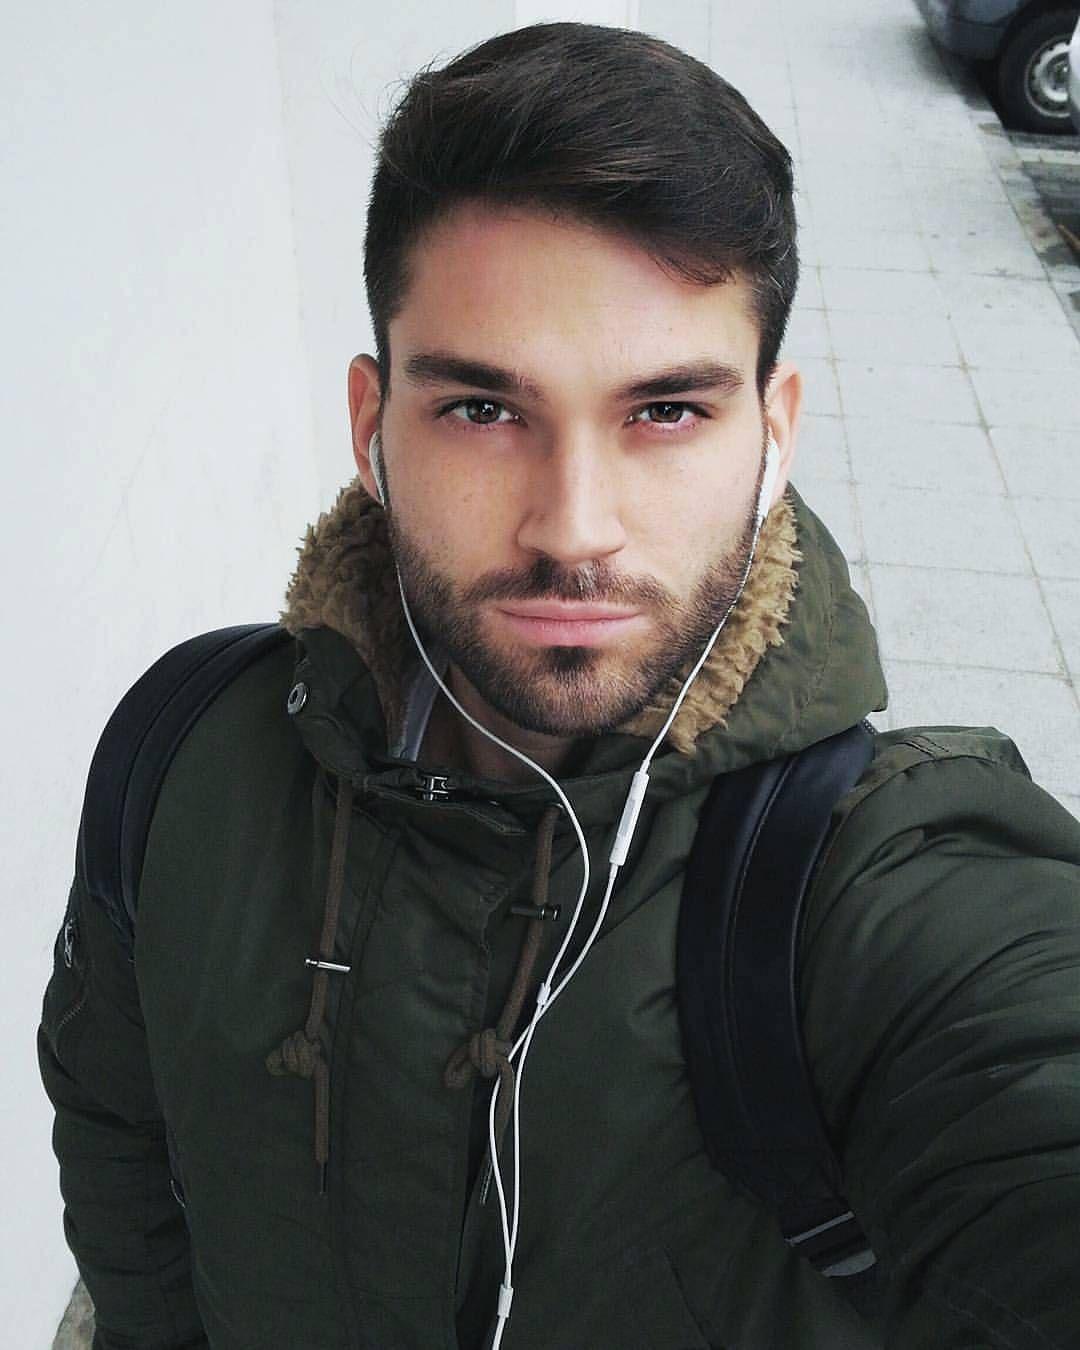 Spanish Boy On Tumblr: #FavoBoys #Sergio Follow @xgio_bdr #SpanishBoy #Madrid